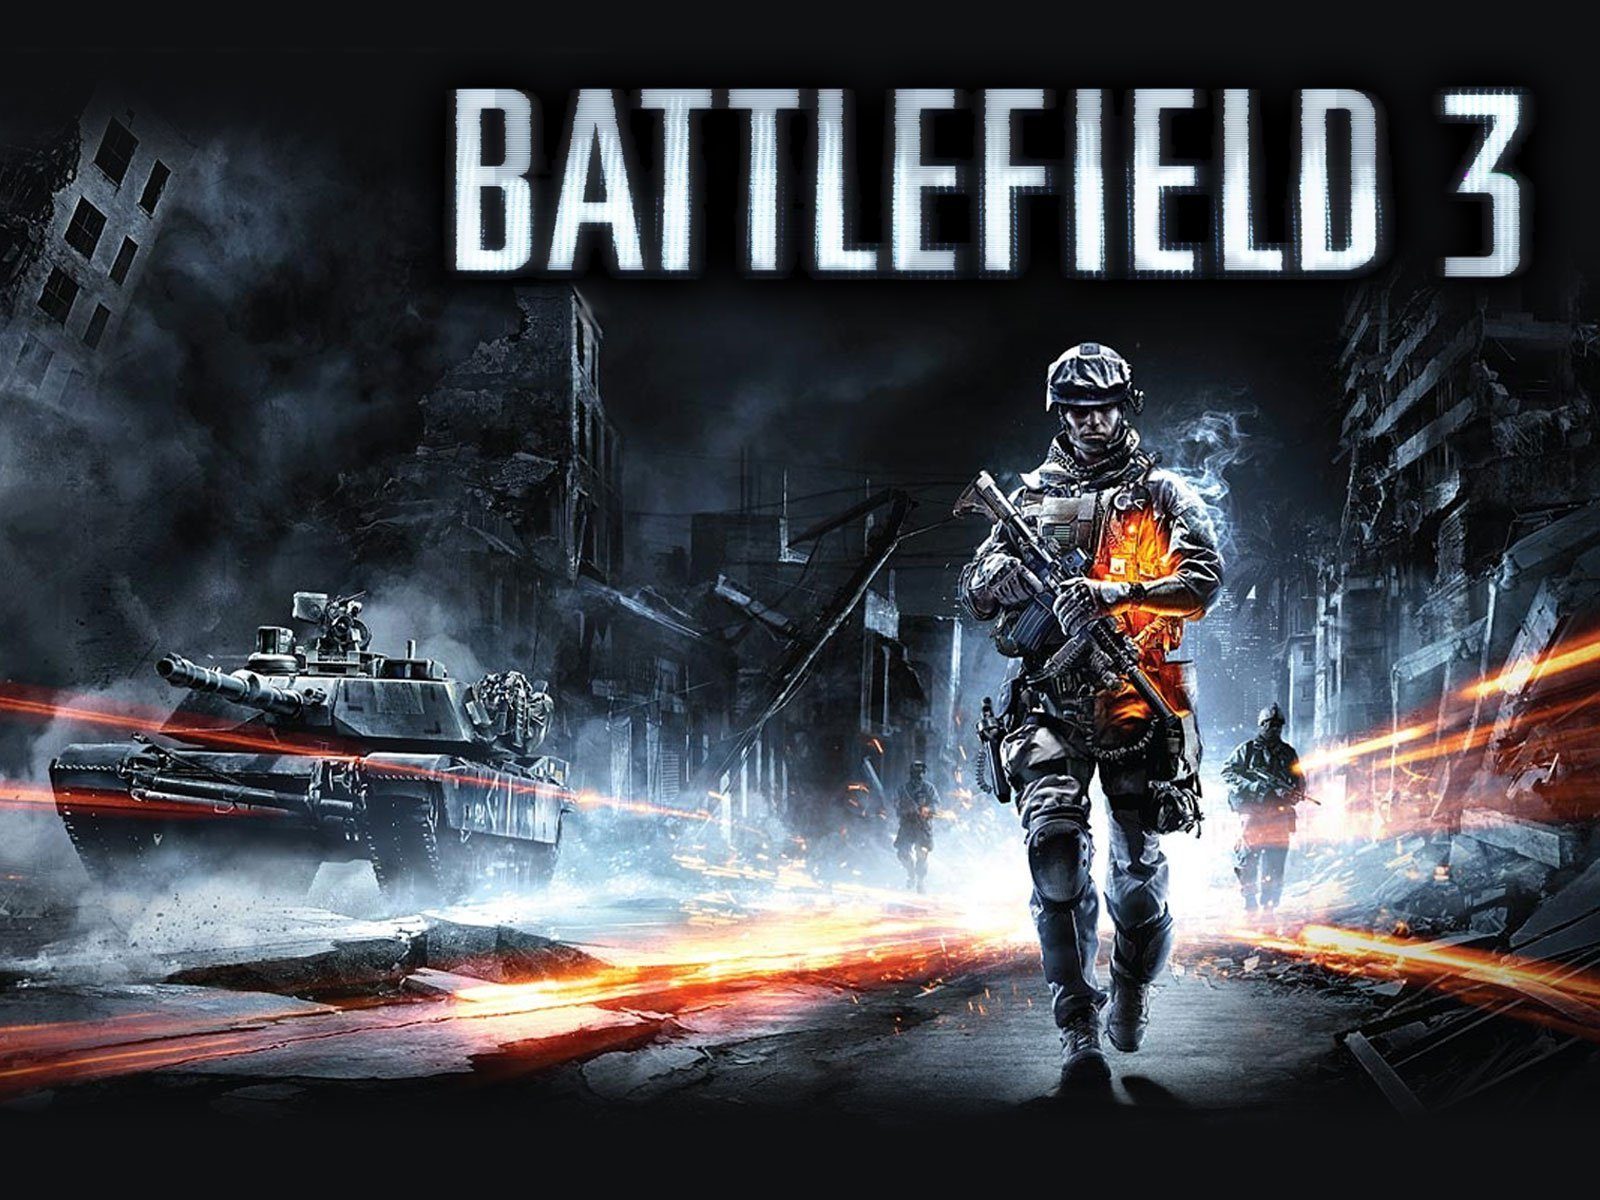 battlefield bad company images battlefield 3 hd wallpaper